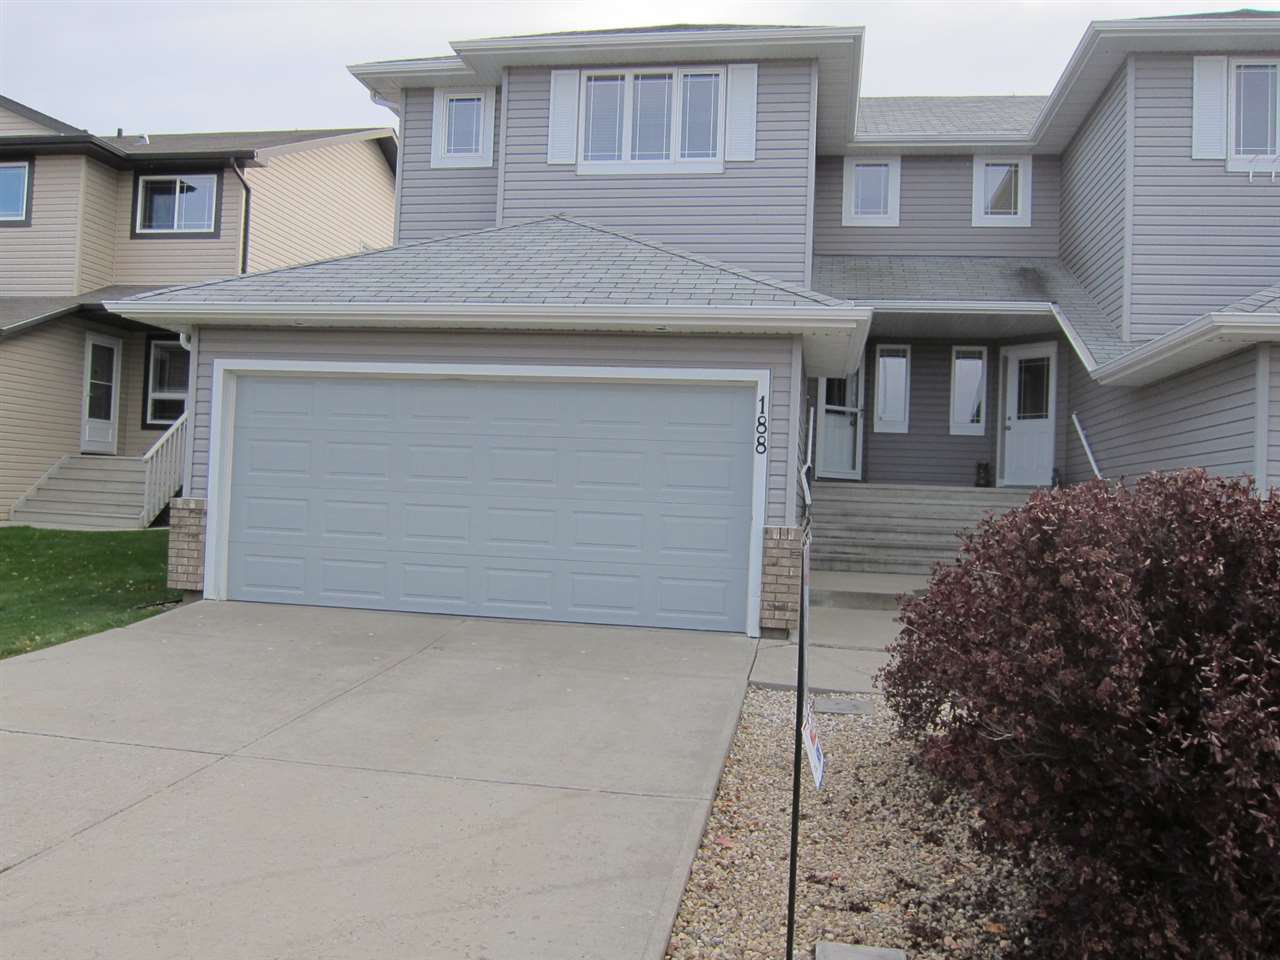 Main Photo: 188 BROOKVIEW Way: Stony Plain House Half Duplex for sale : MLS®# E4189477